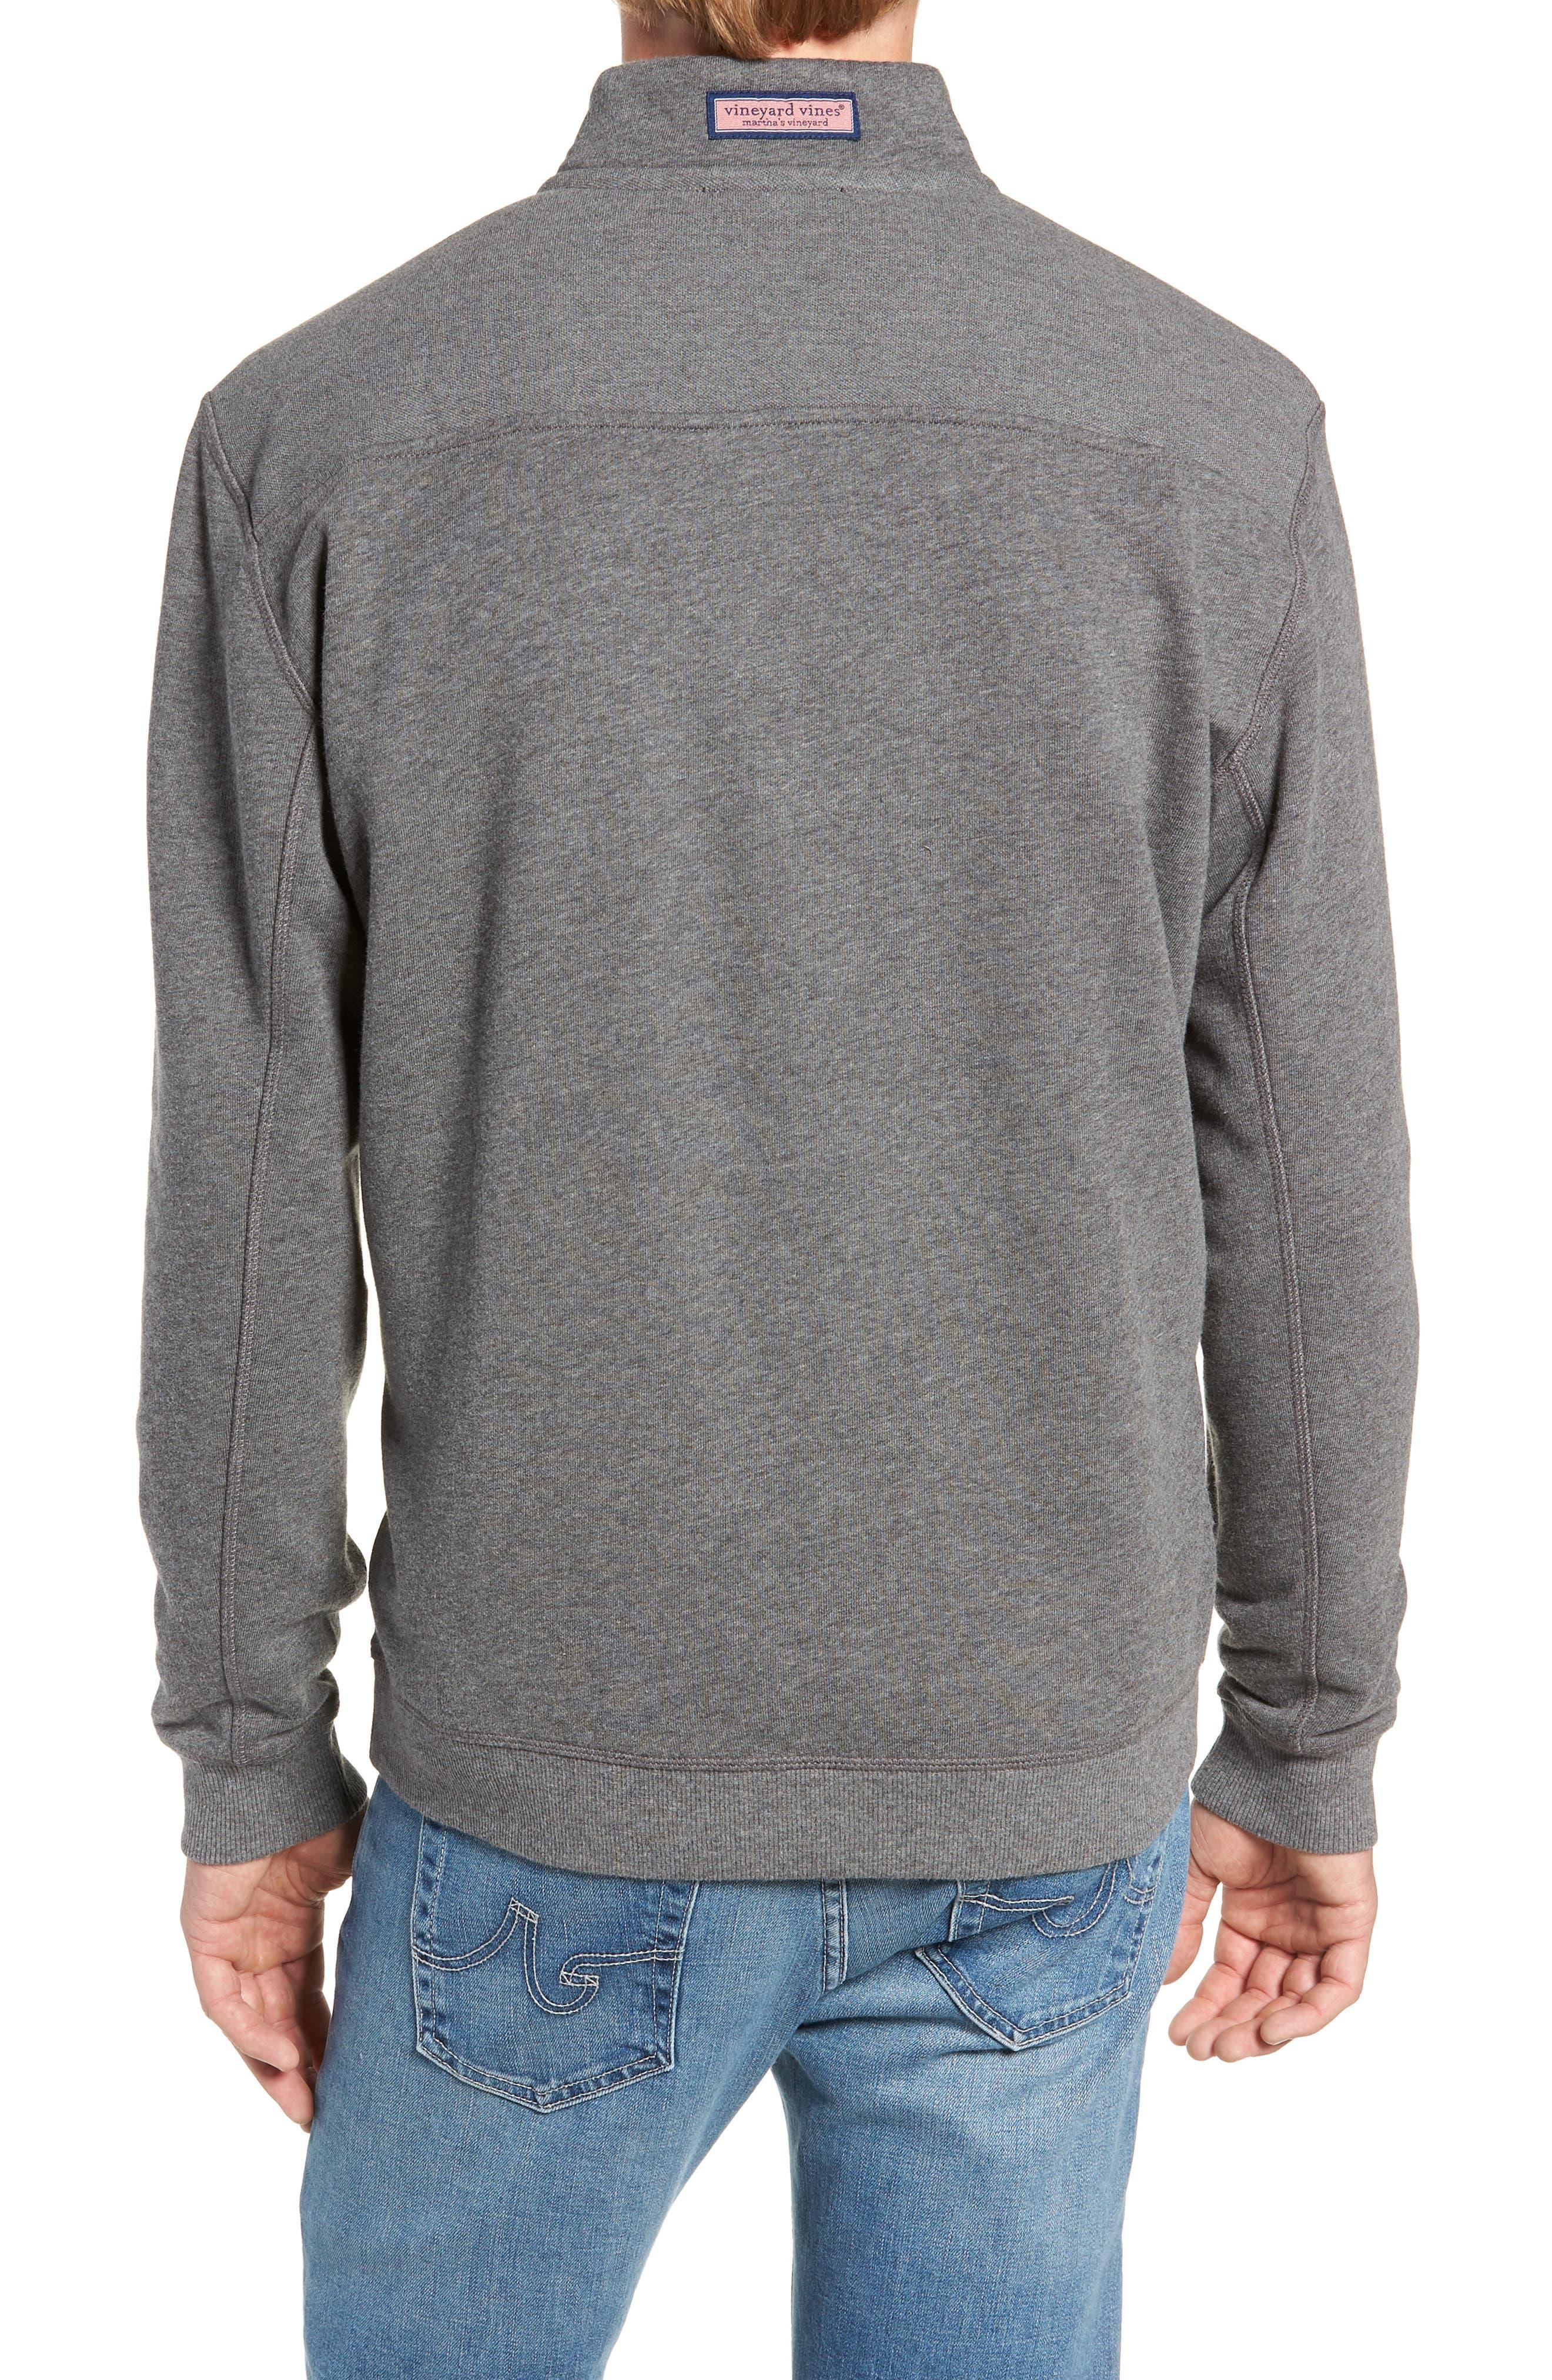 VINEYARD VINES,                             Collegiate Half Zip Pullover,                             Alternate thumbnail 2, color,                             023